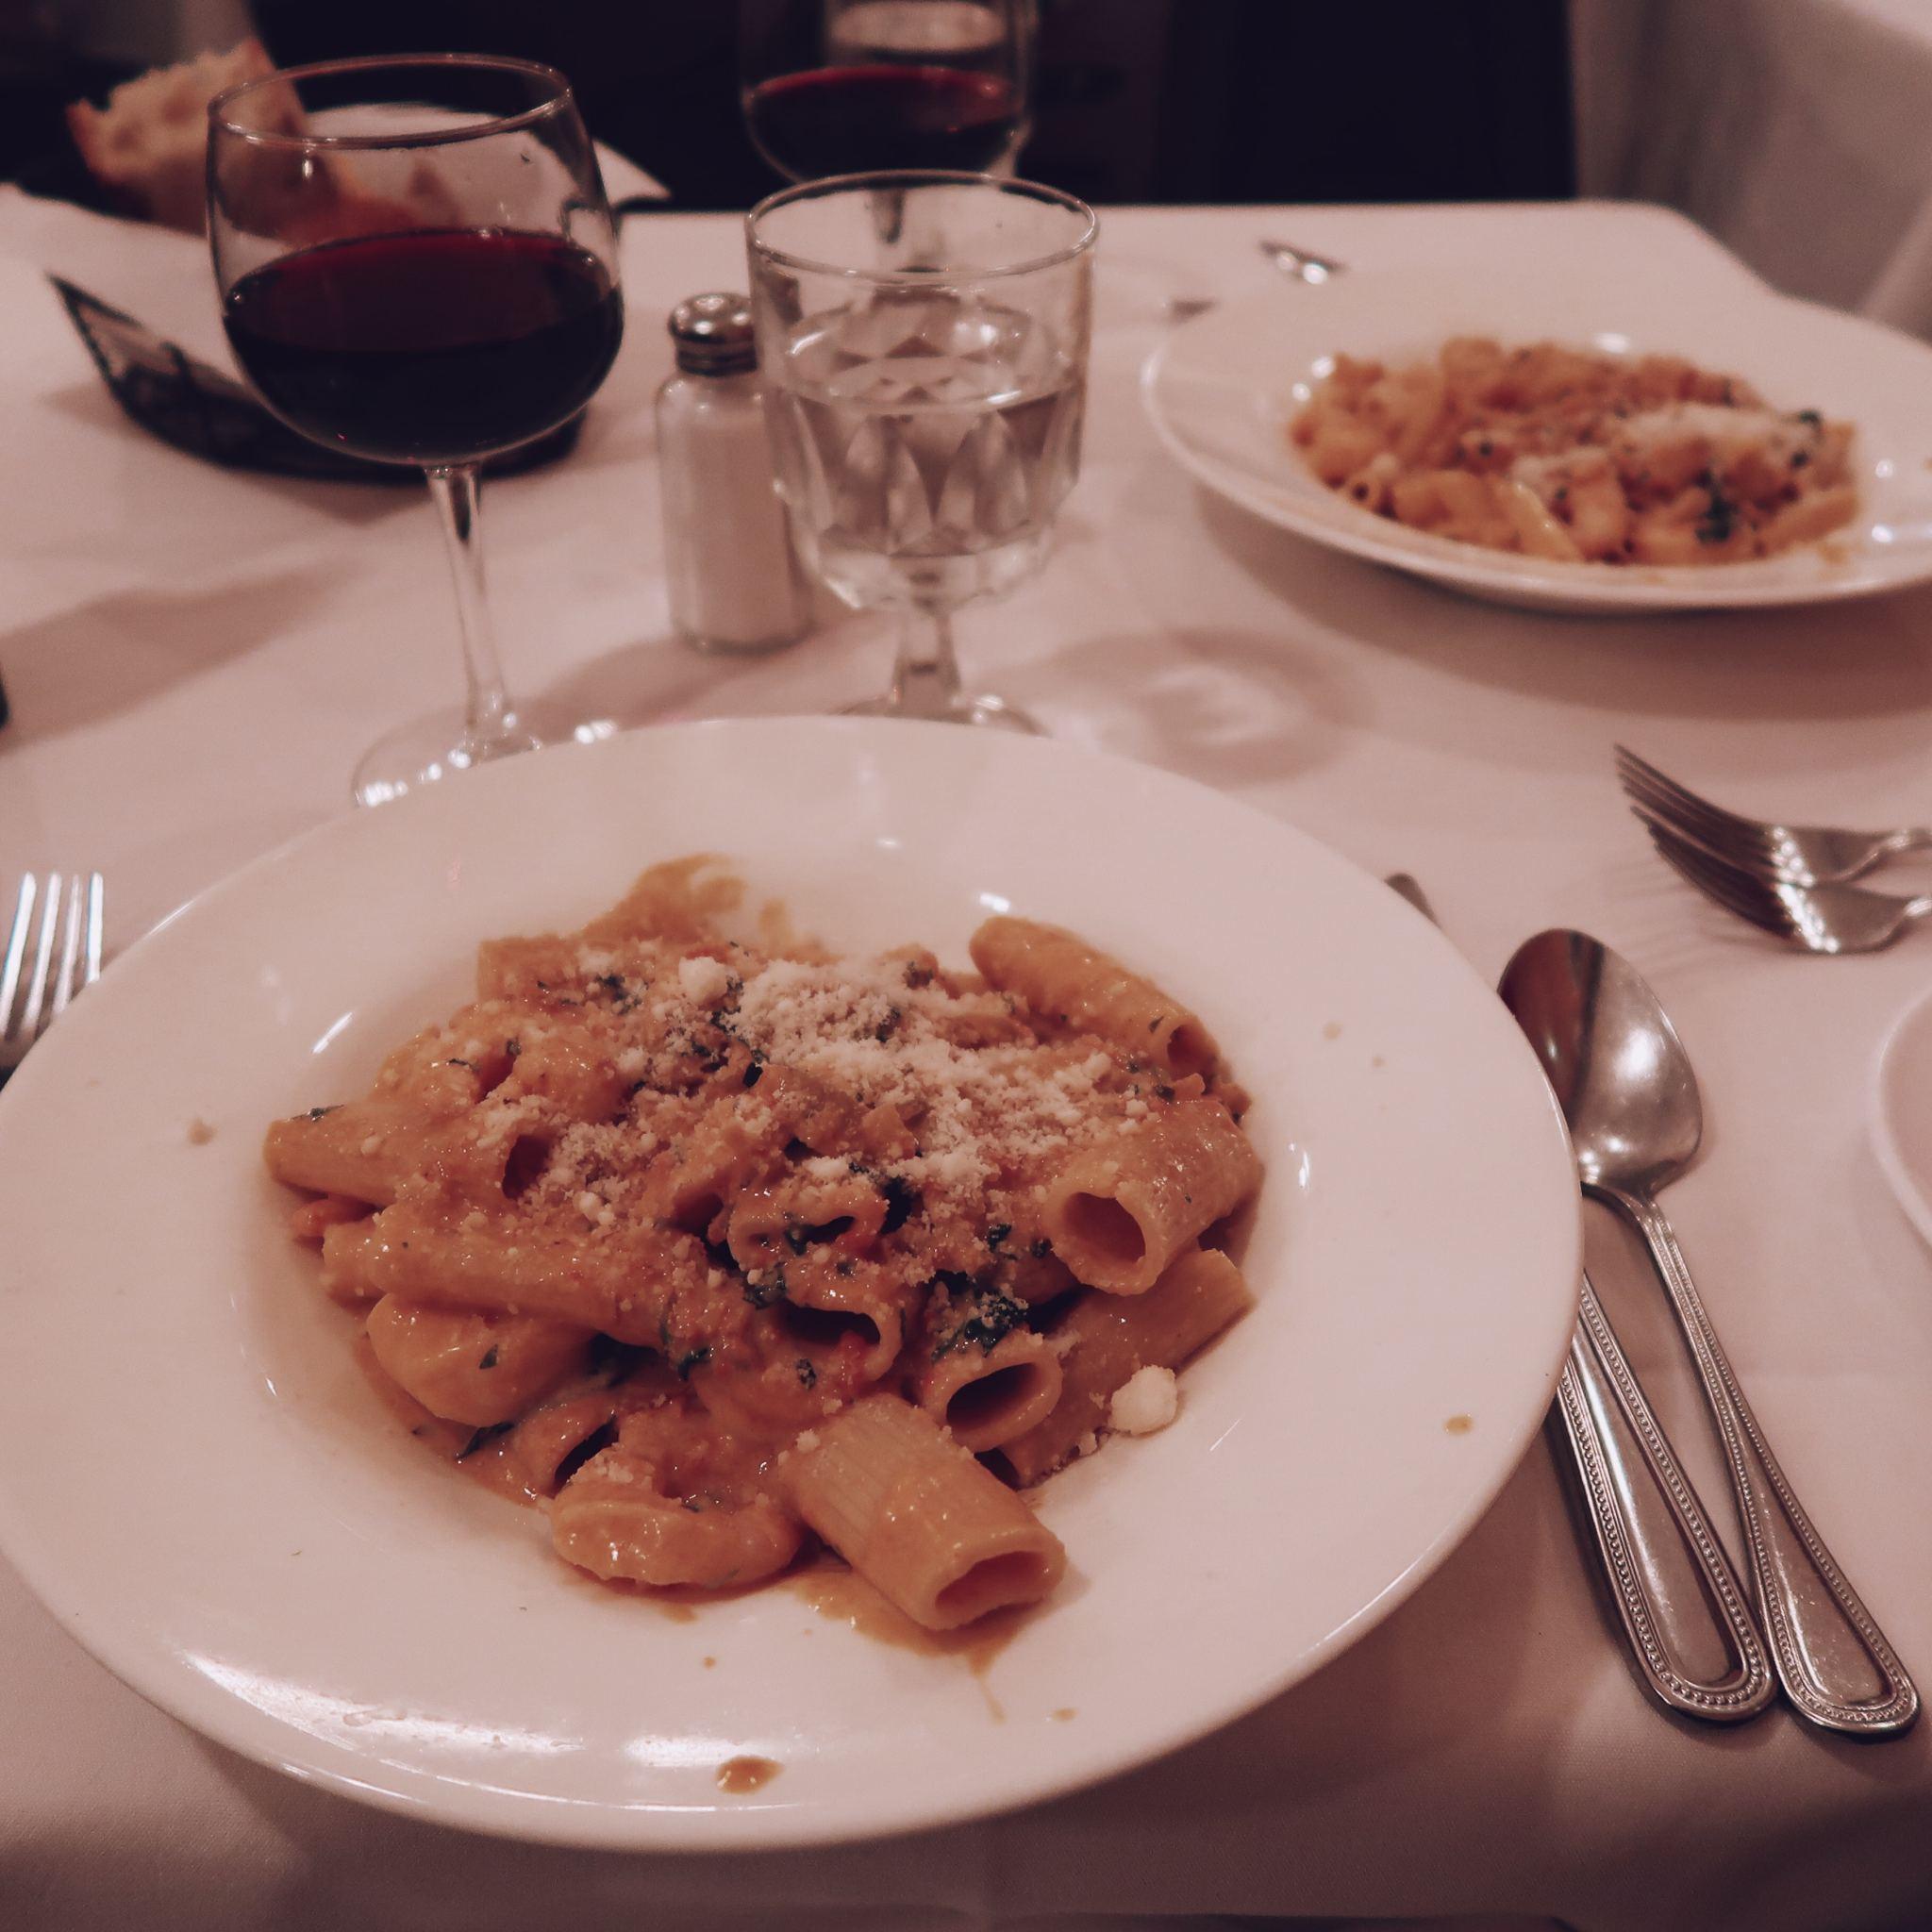 food nyc new york avocado toast pasta omelettes cafe diner starbucks wine happy cocoa chelsea